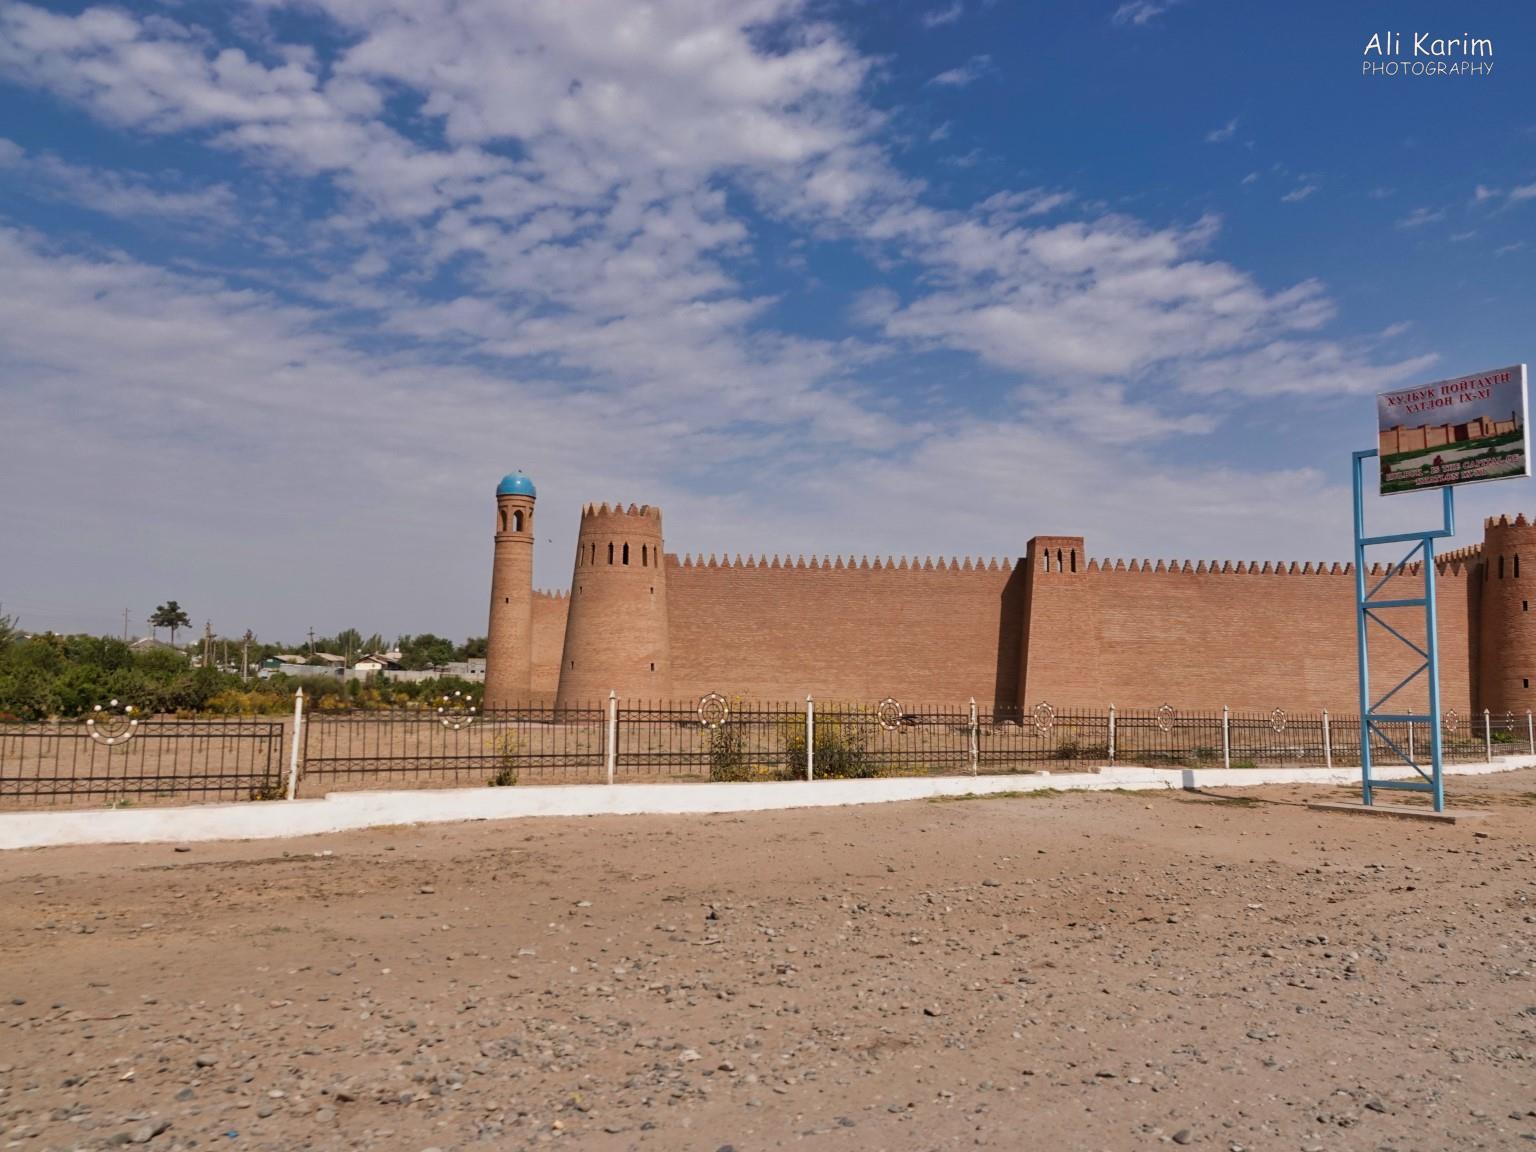 Dushanbe, Tajikistan Interesting restored castle at Hulbuk town